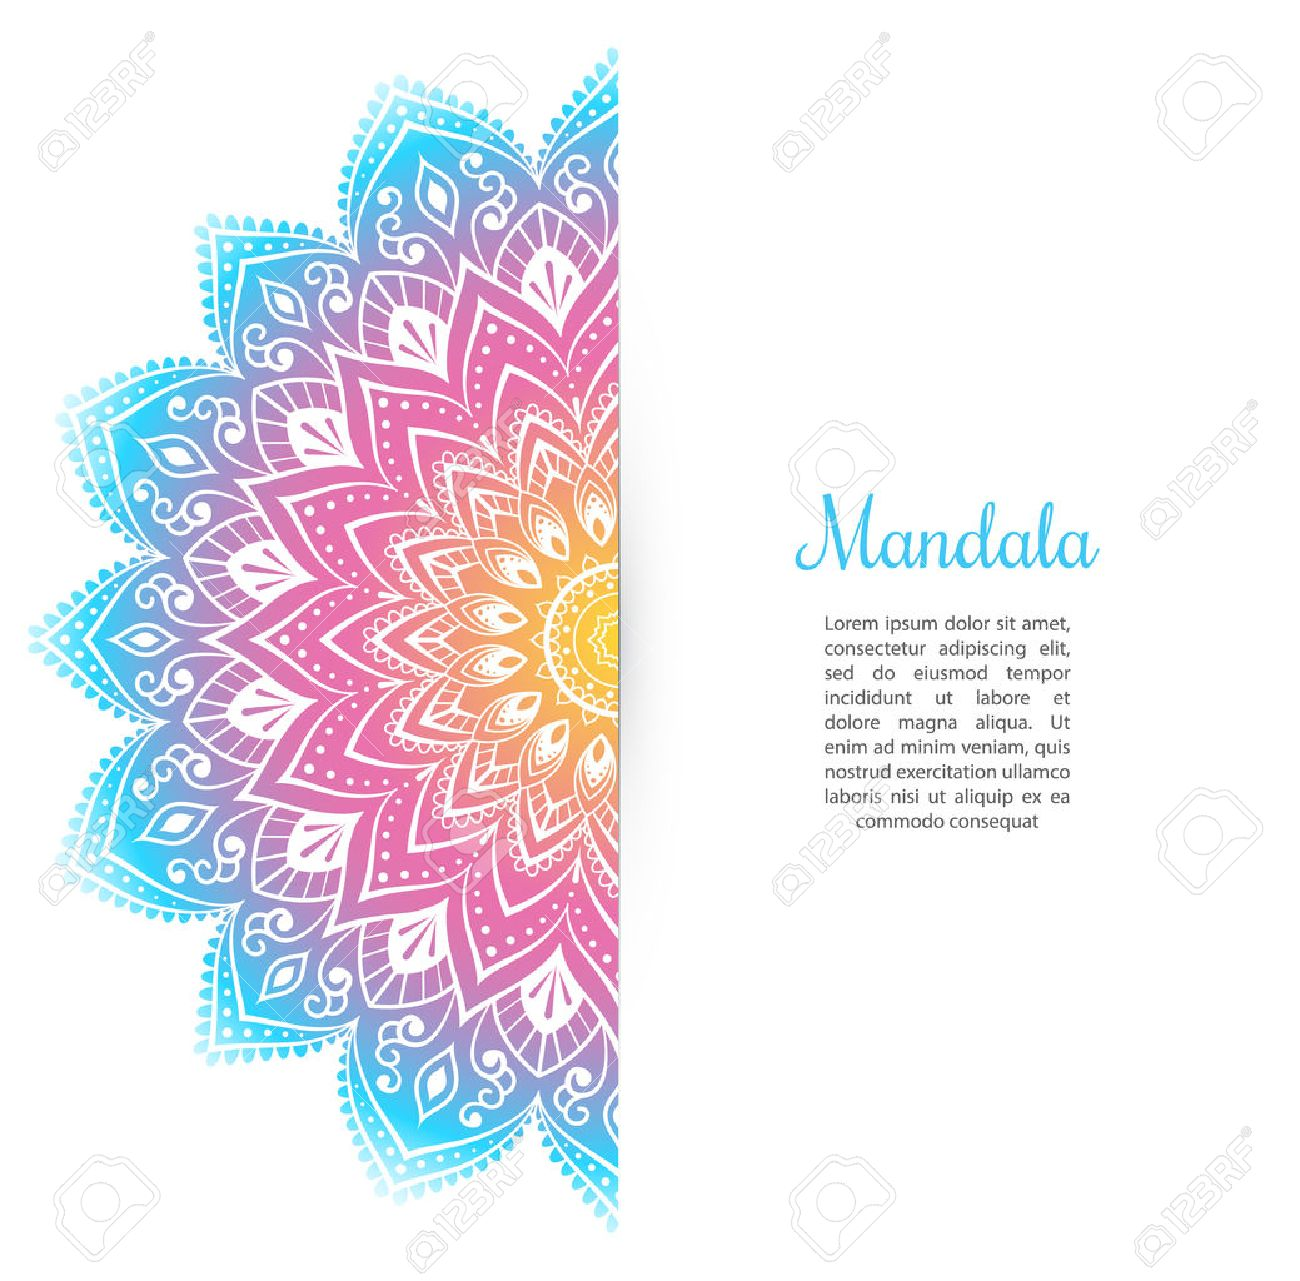 Vector illustration of Color Mandala background template - 44081241